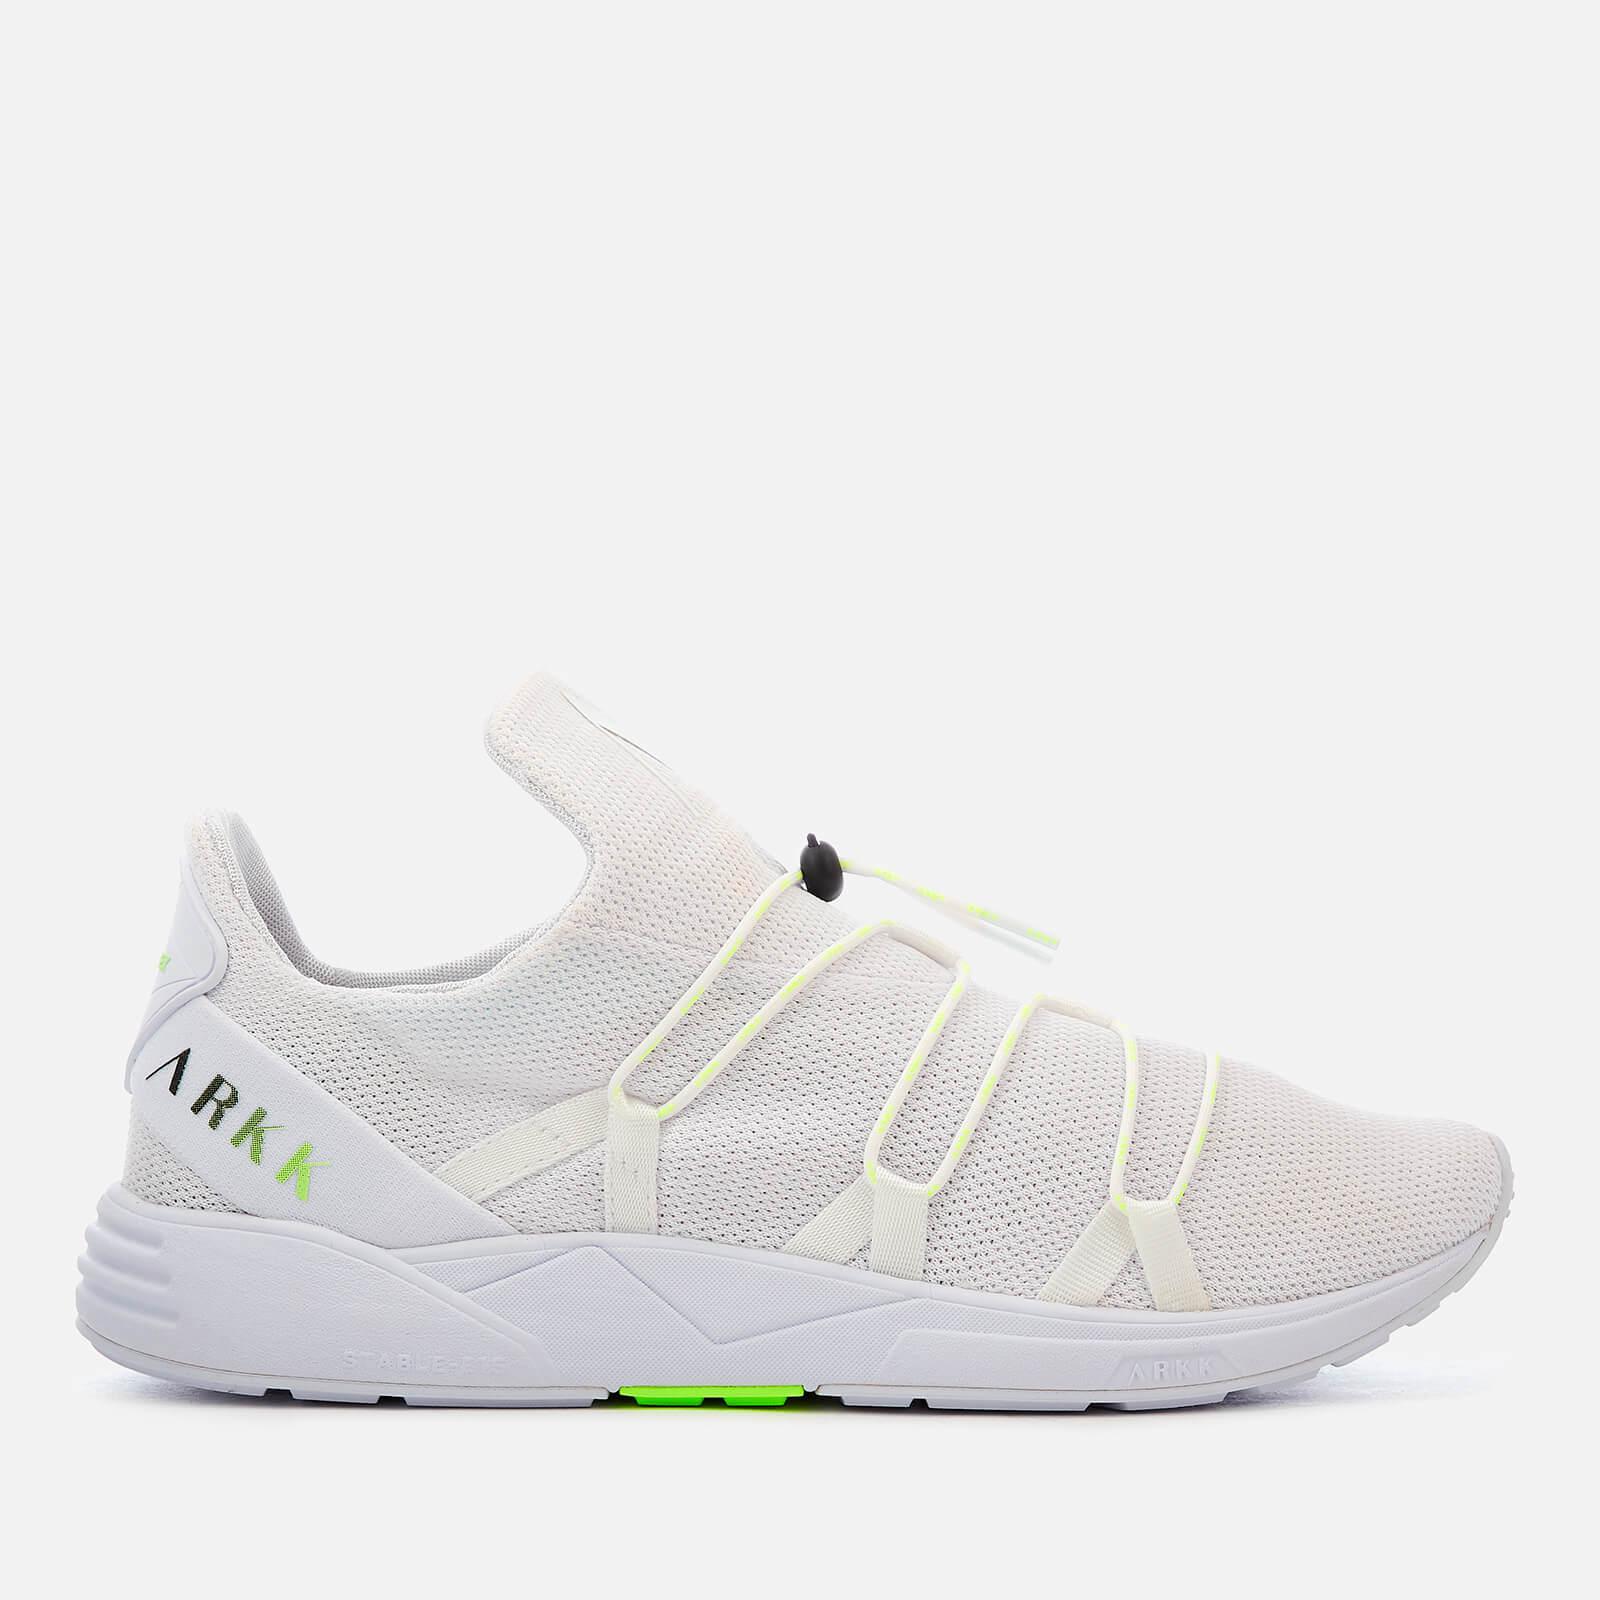 c5af4542b ARKK Copenhagen Men s Scorpitex Mesh Trainers - White Luminous Green Mens  Footwear